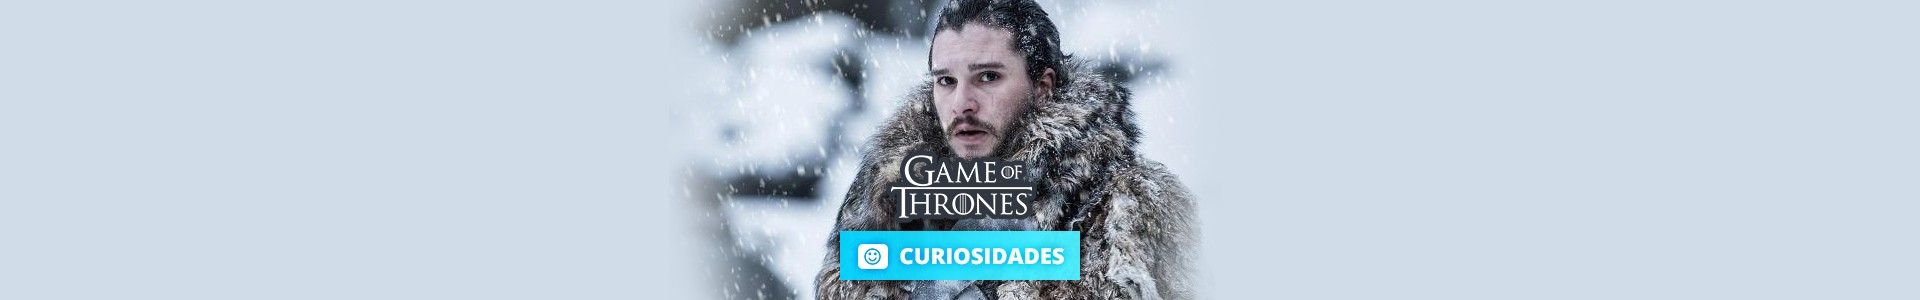 17 Curiosidades sobre Game of Thrones